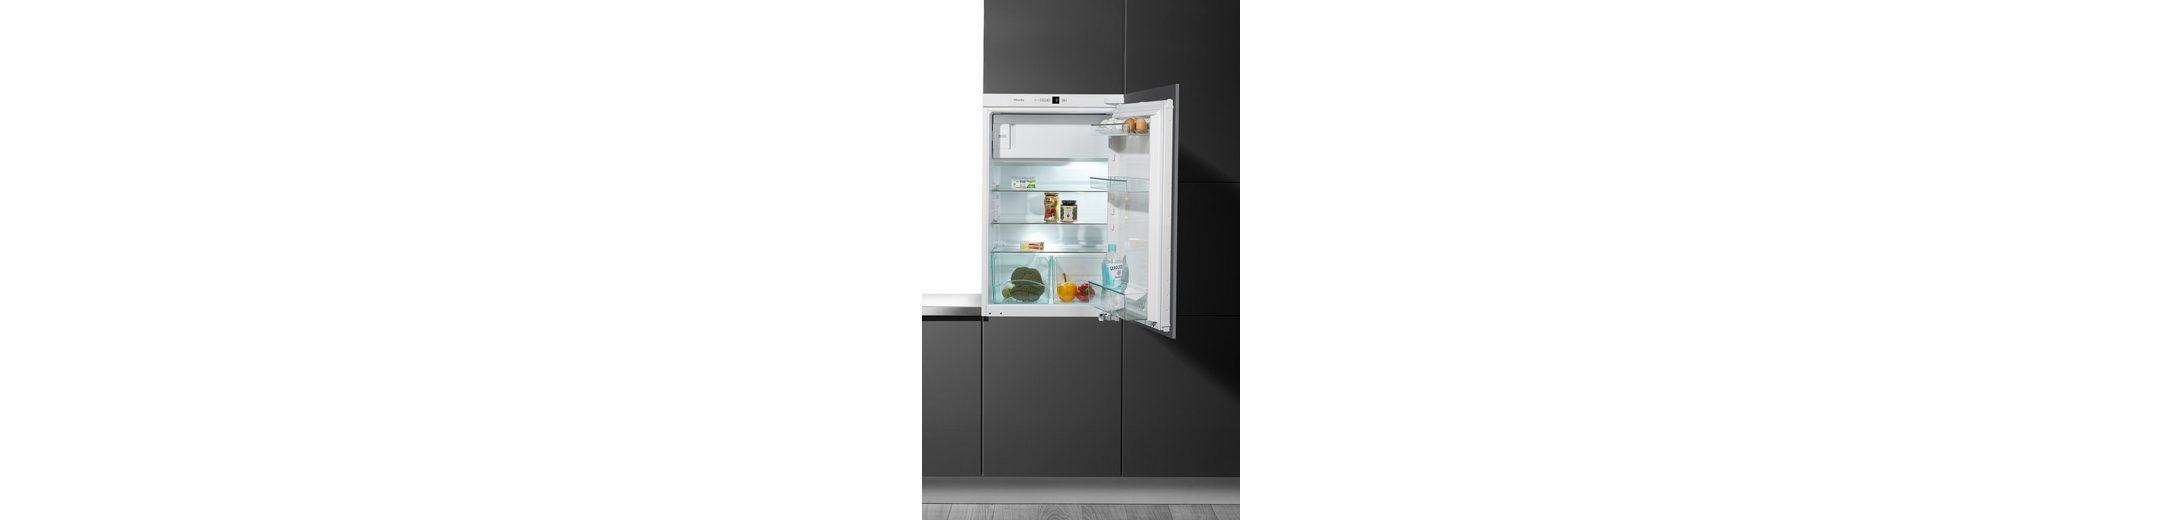 Miele integrierbarer Einbau-Kühlautomat K 32142 iF, A++